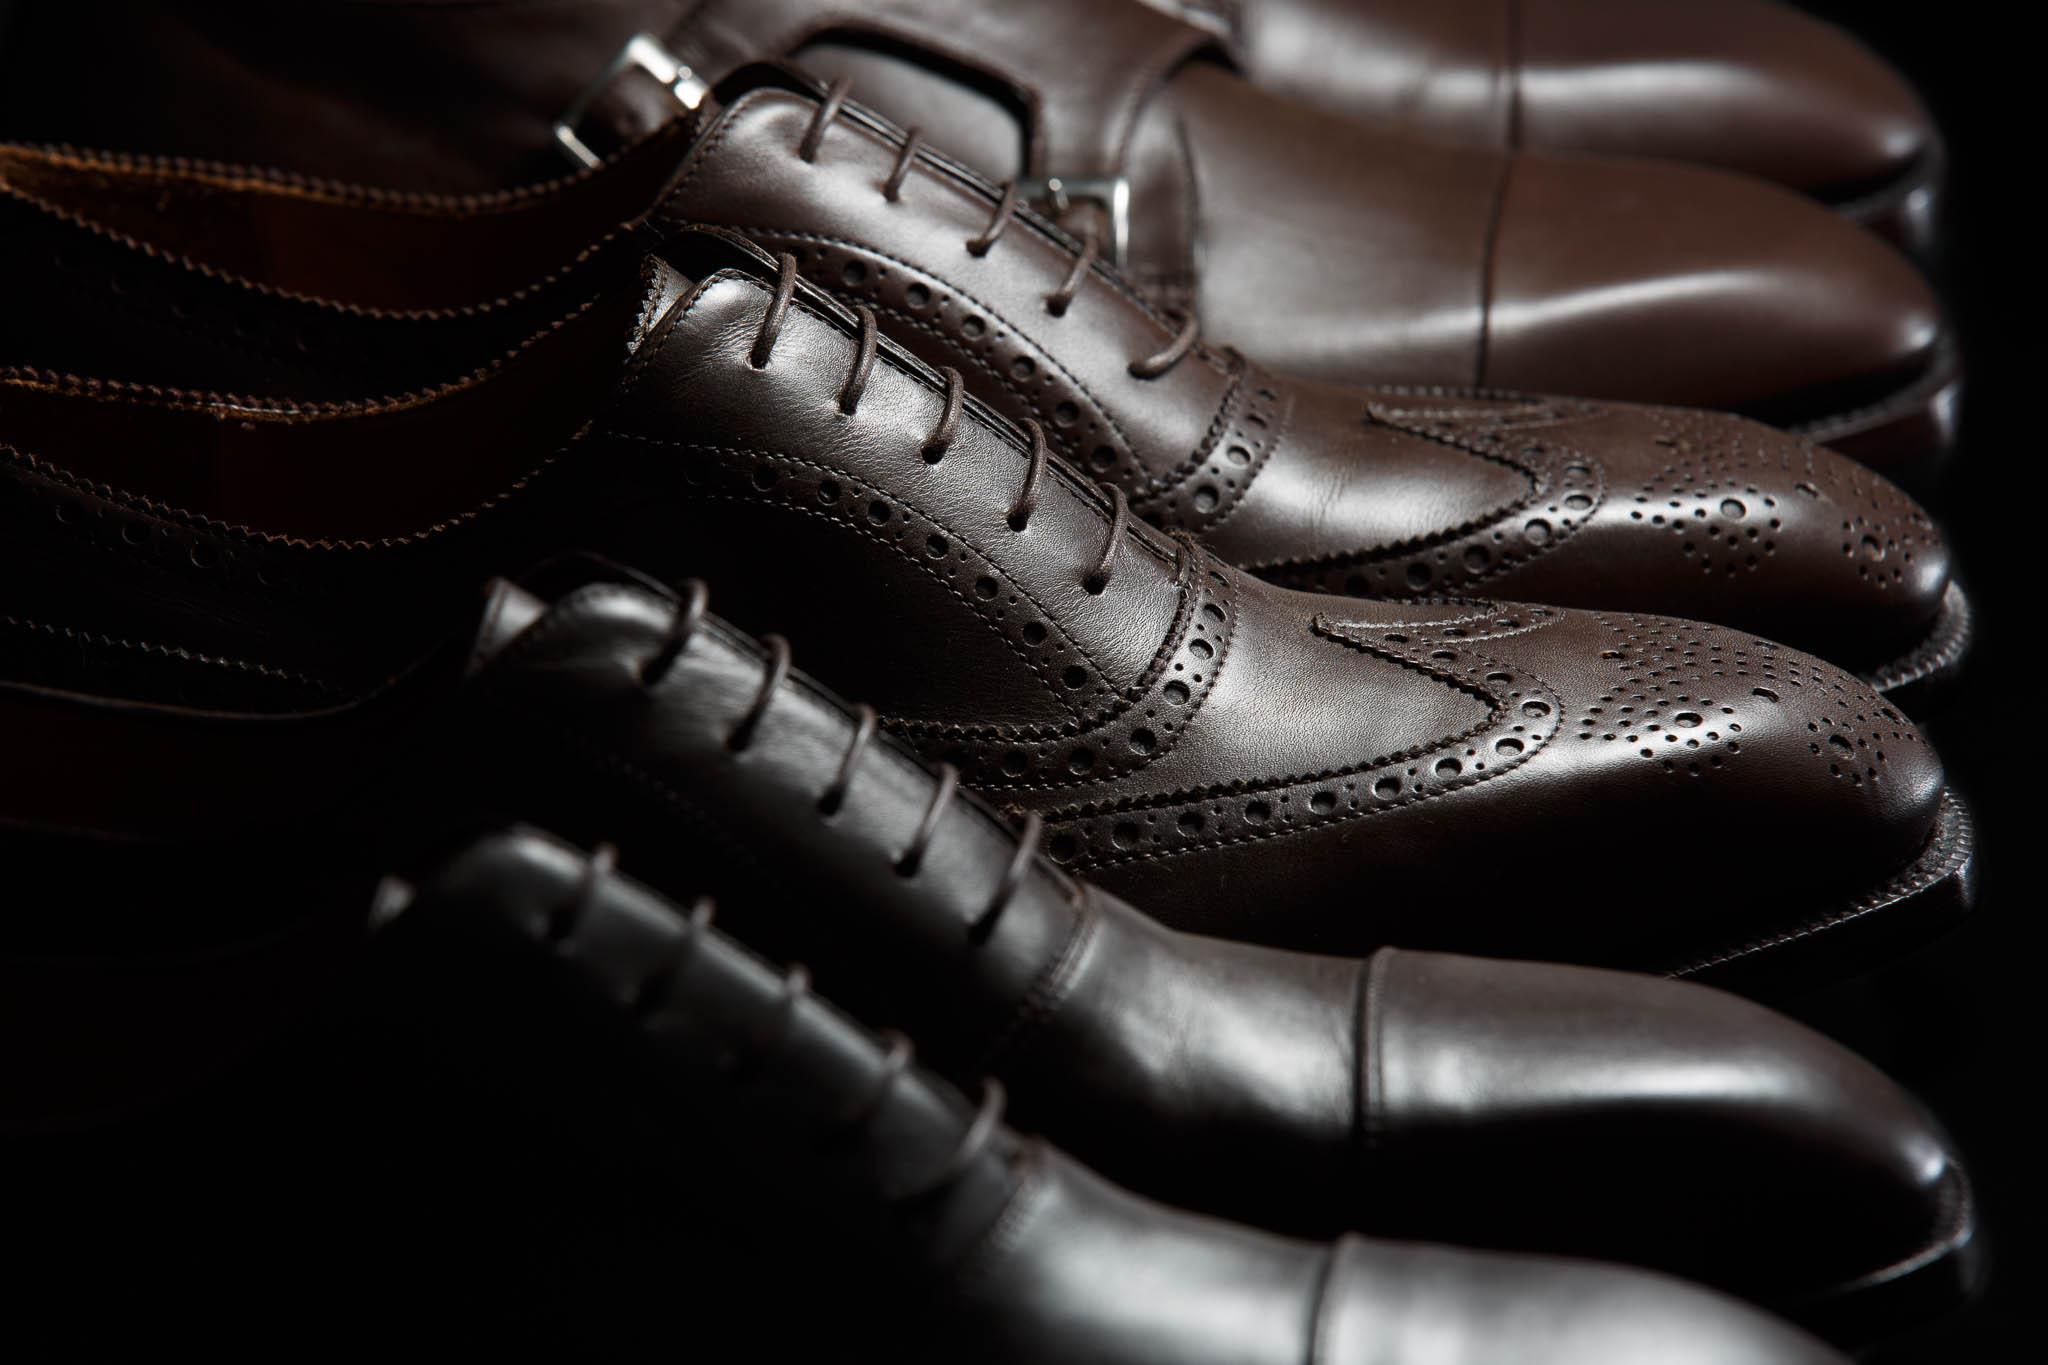 170729_Archibald_Shoes_016.jpg